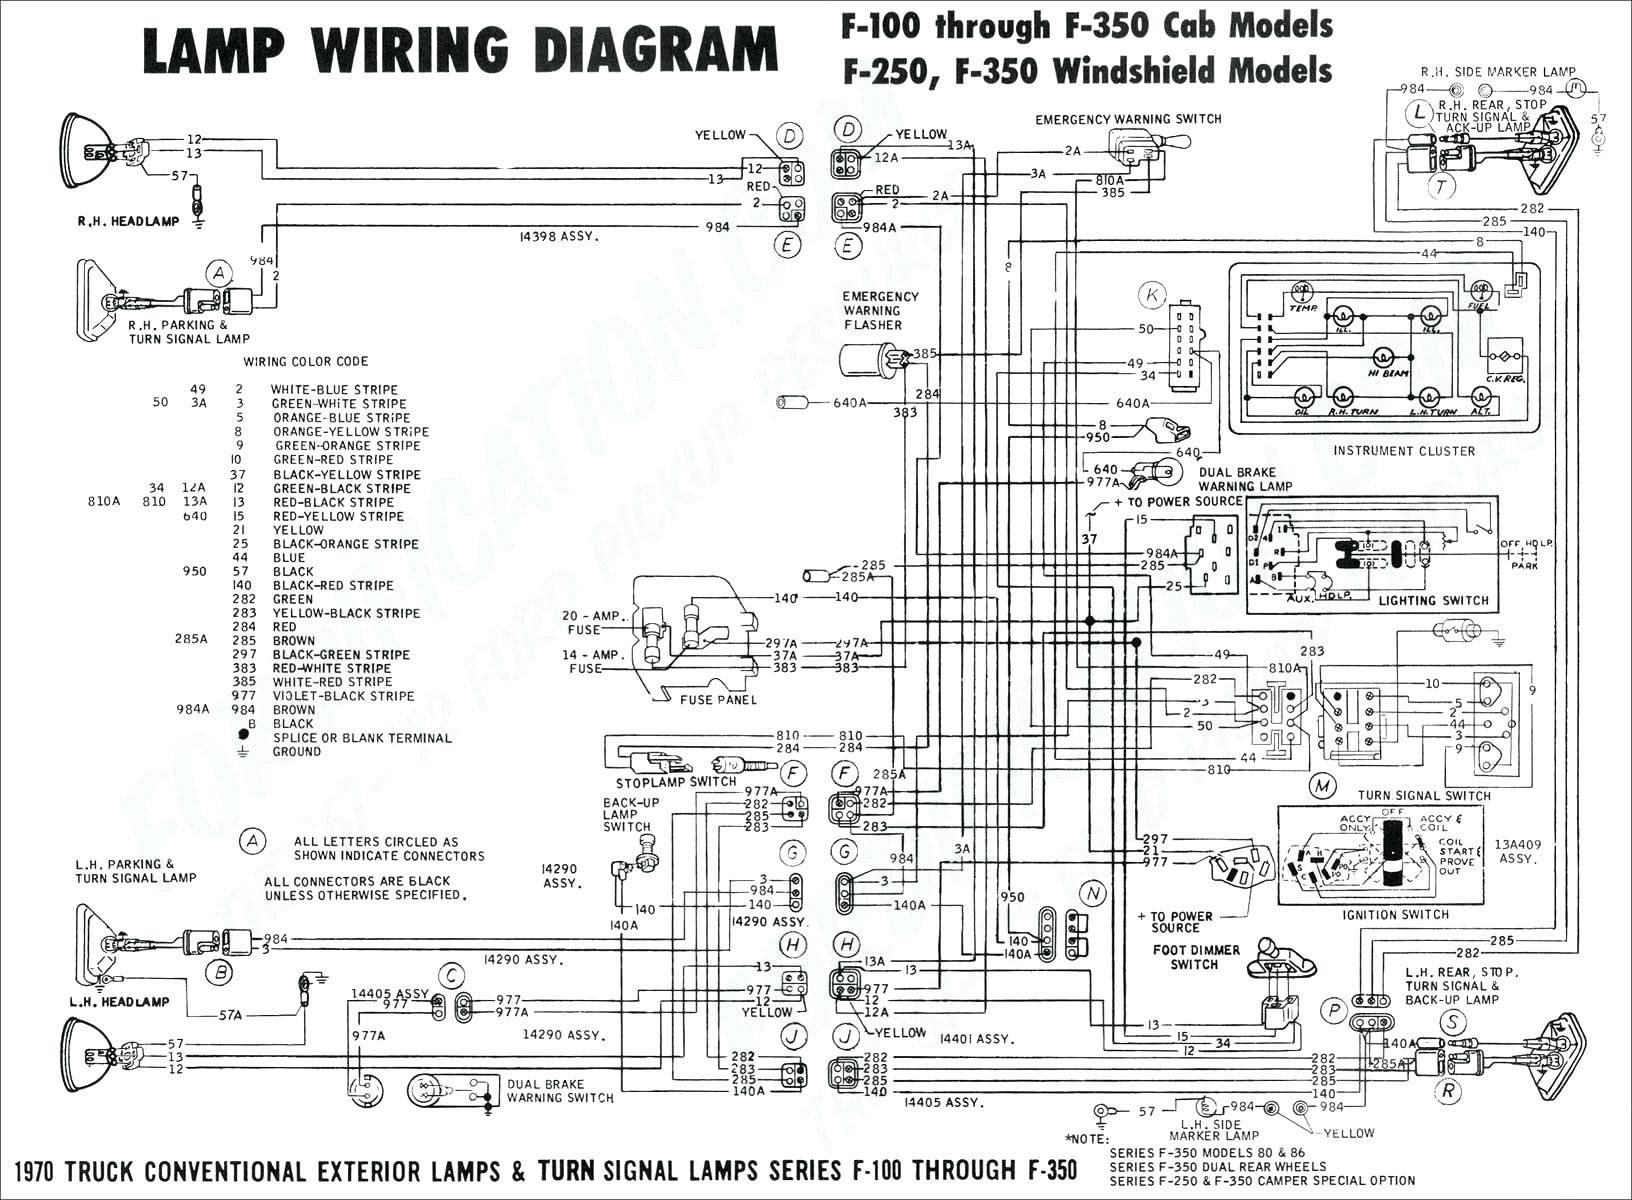 2000 F150 Wiring Diagram Tail Wiring Diagram Instruct Instruct Cfcarsnoleggio It